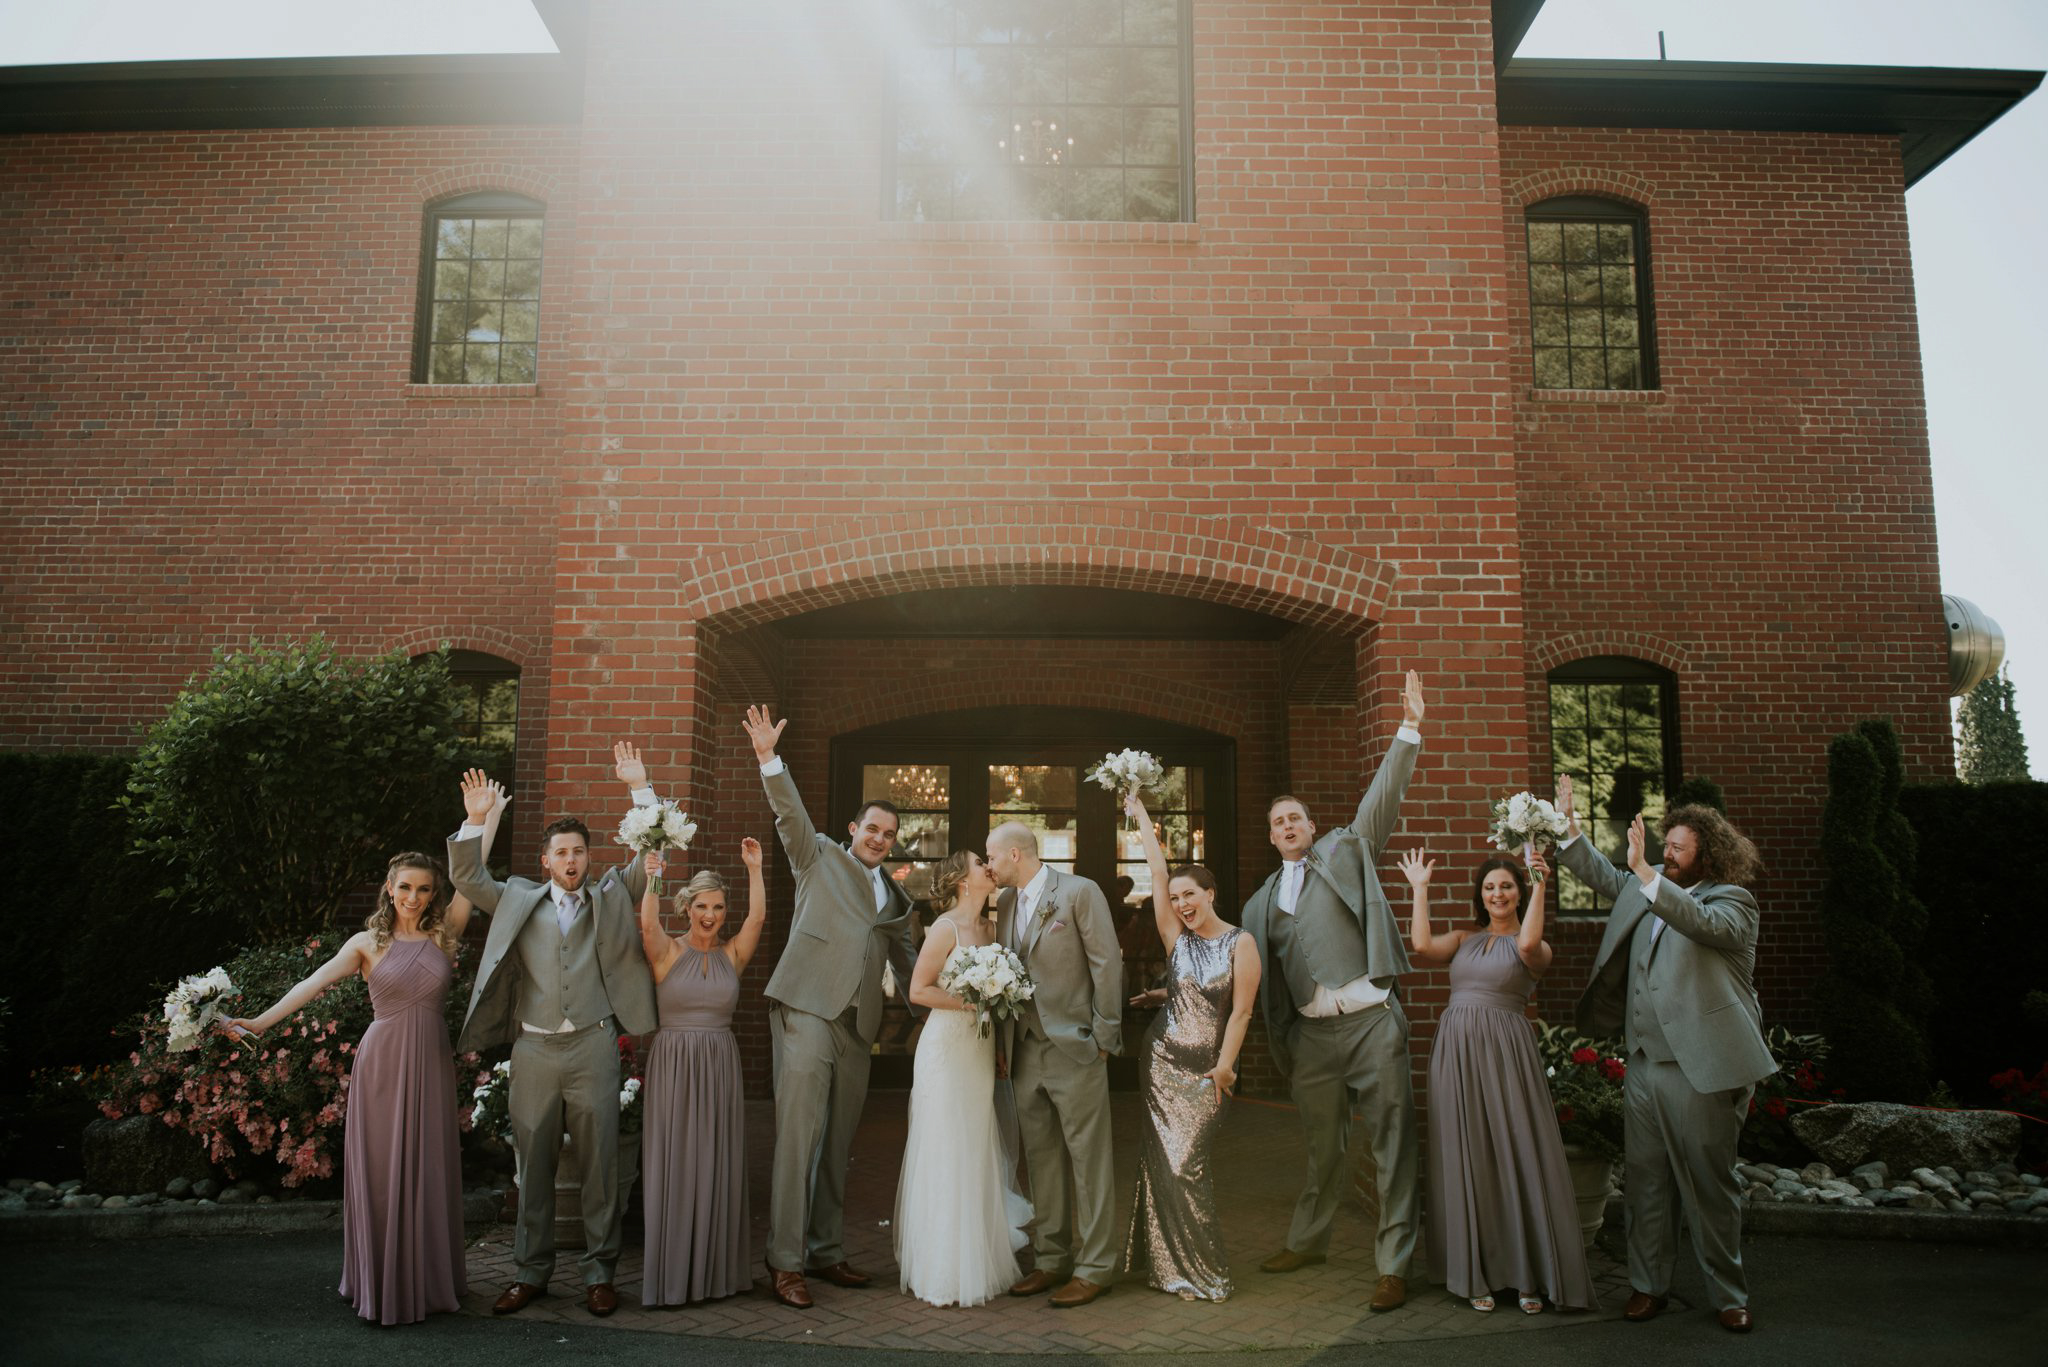 hollywood-school-house-wedding-seattle-photographer-caitlyn-nikula-52.jpg